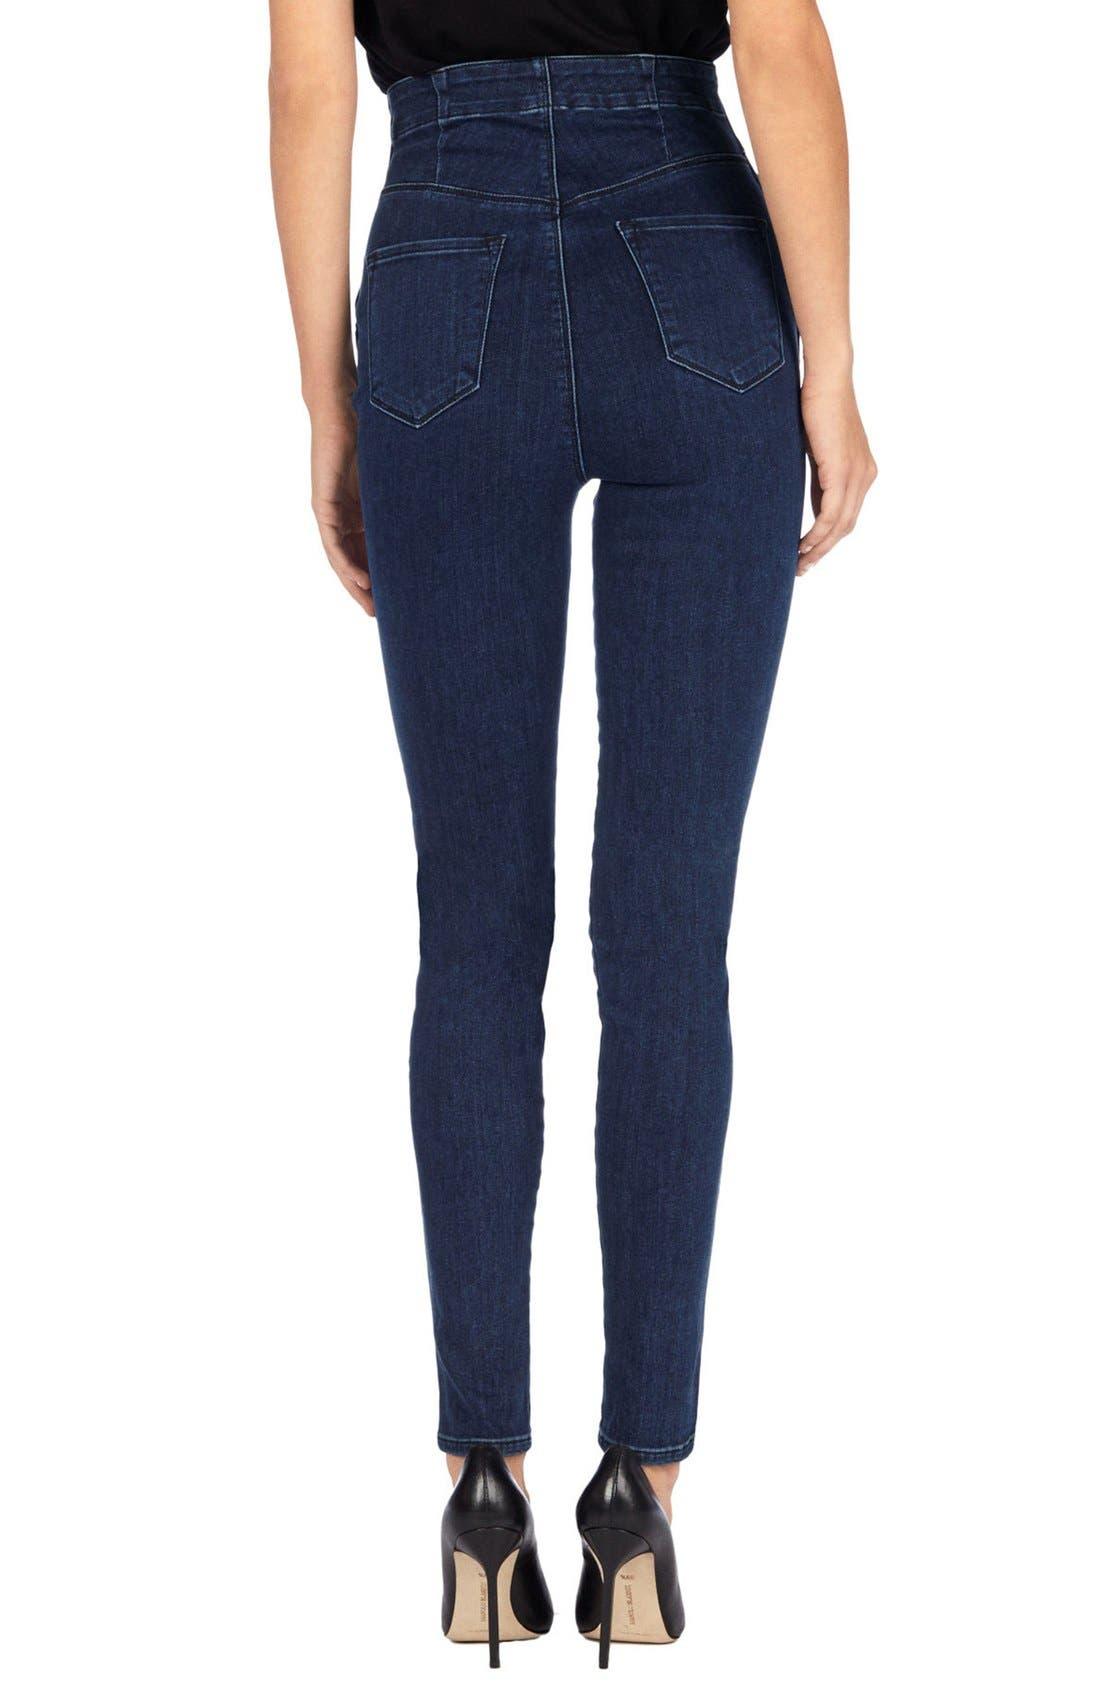 'Natasha Sky High' High Rise Skinny Jeans,                             Alternate thumbnail 3, color,                             410